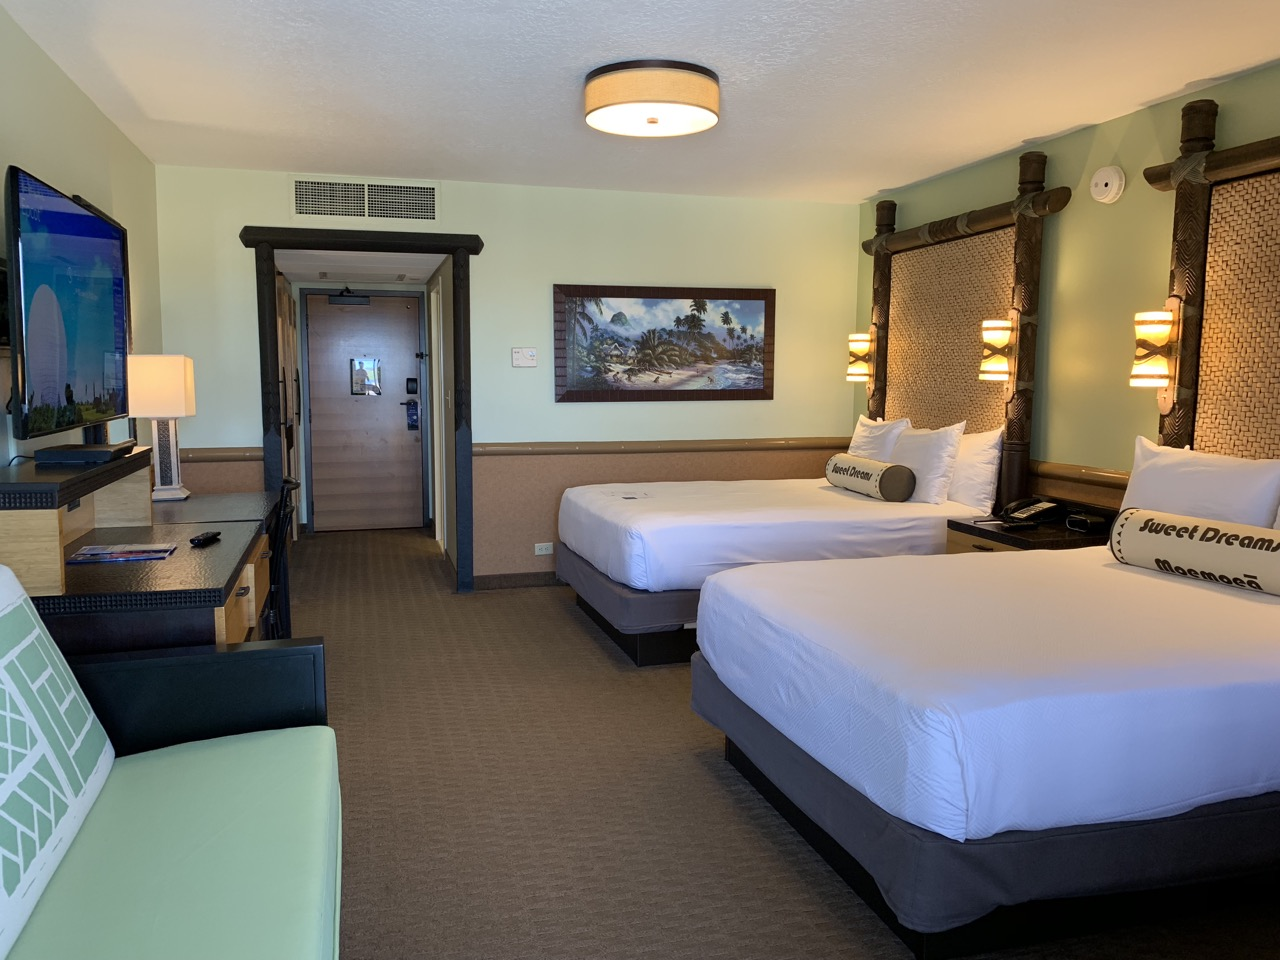 disney world best deluxe resort hotel ranking 09 polynesian room.jpeg